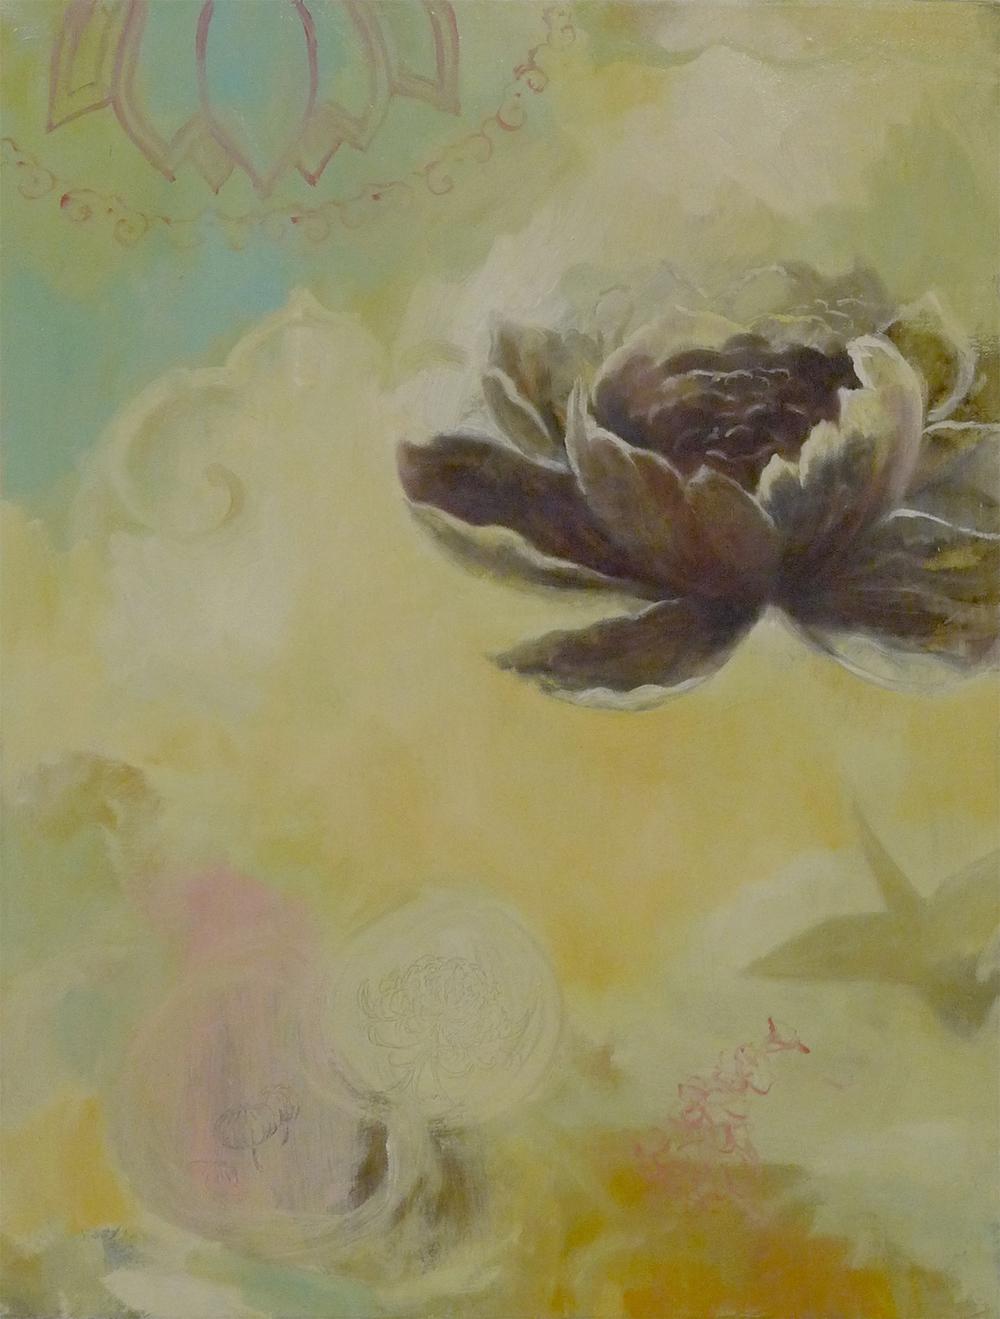 Tian 2010 oil on canvas 56 x 61cm 700 jpeg copy.jpg